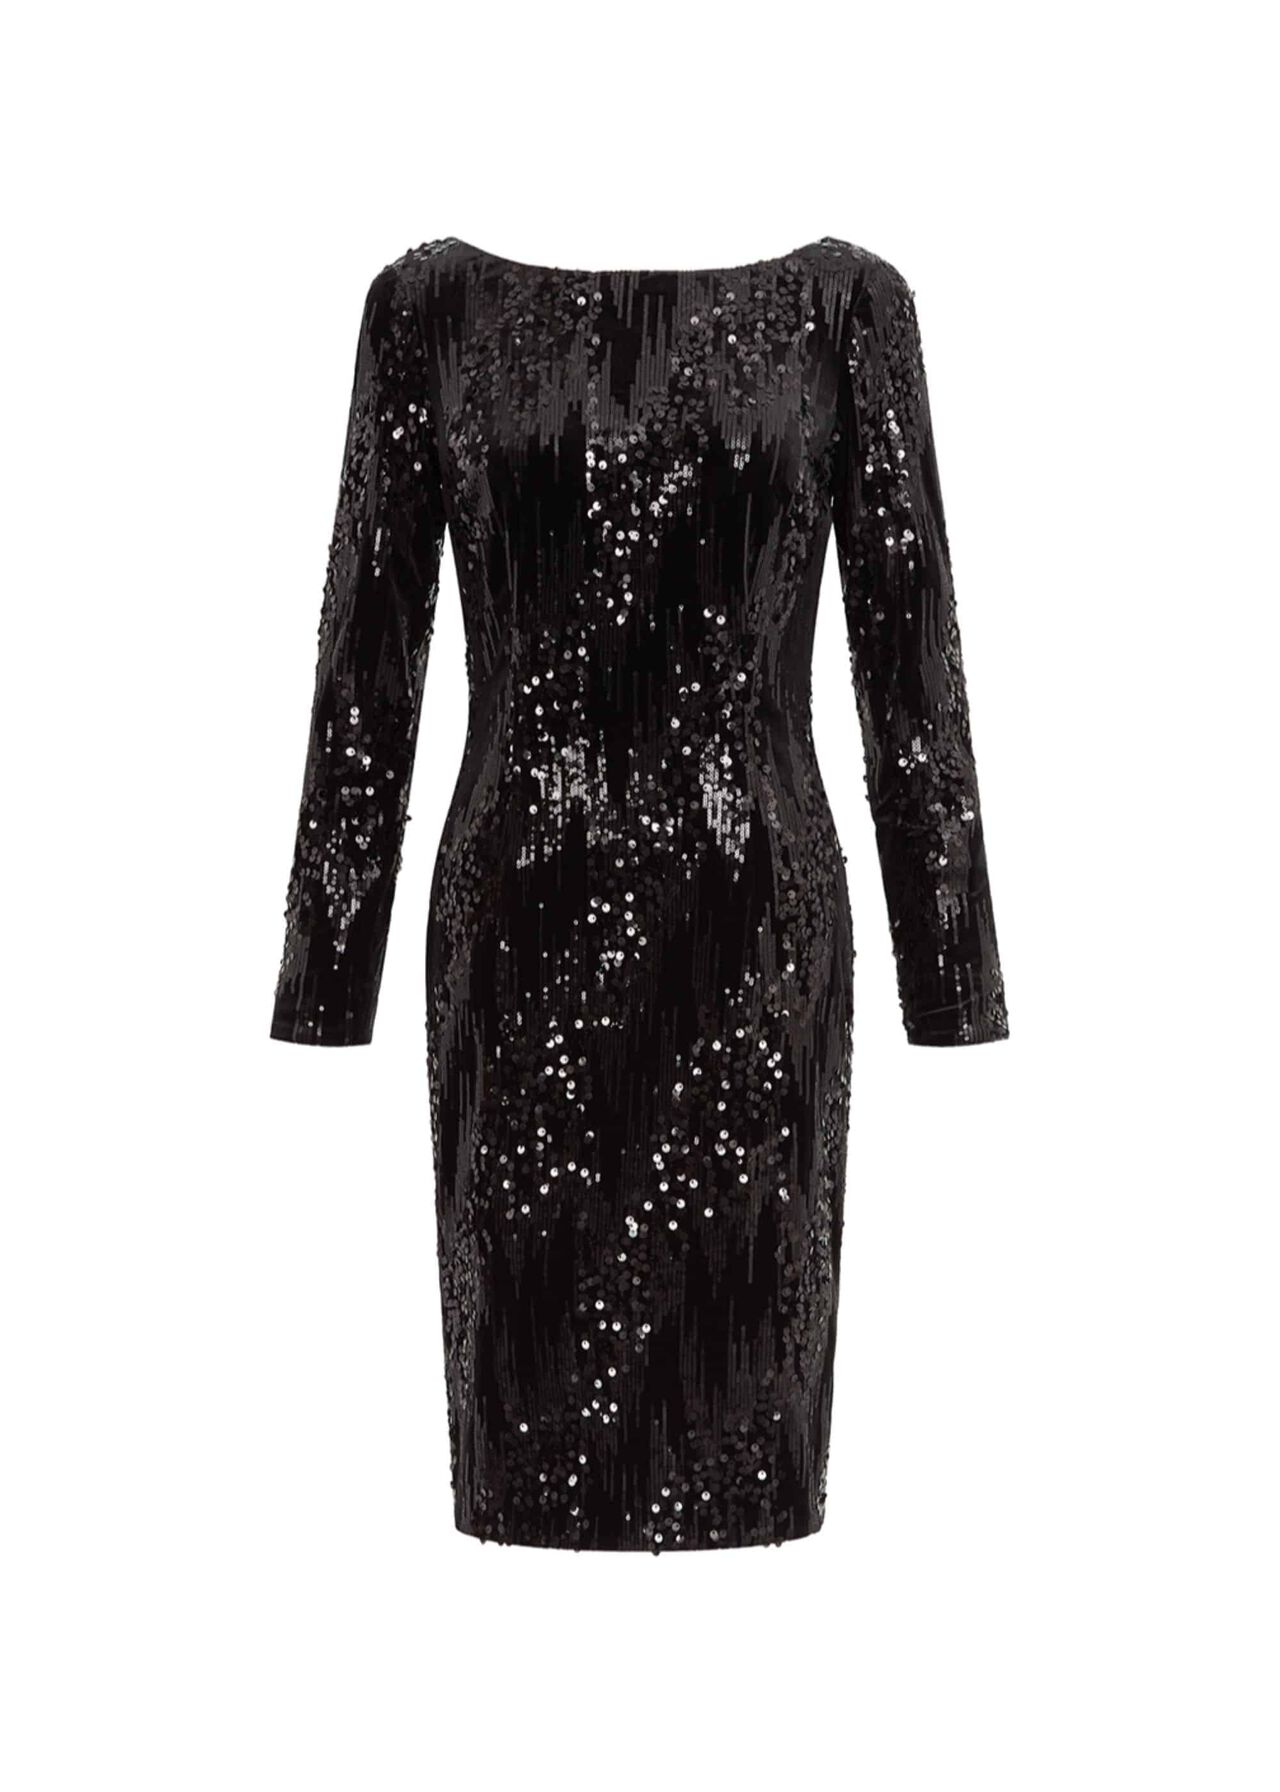 Sawyer Sequin Dress Black